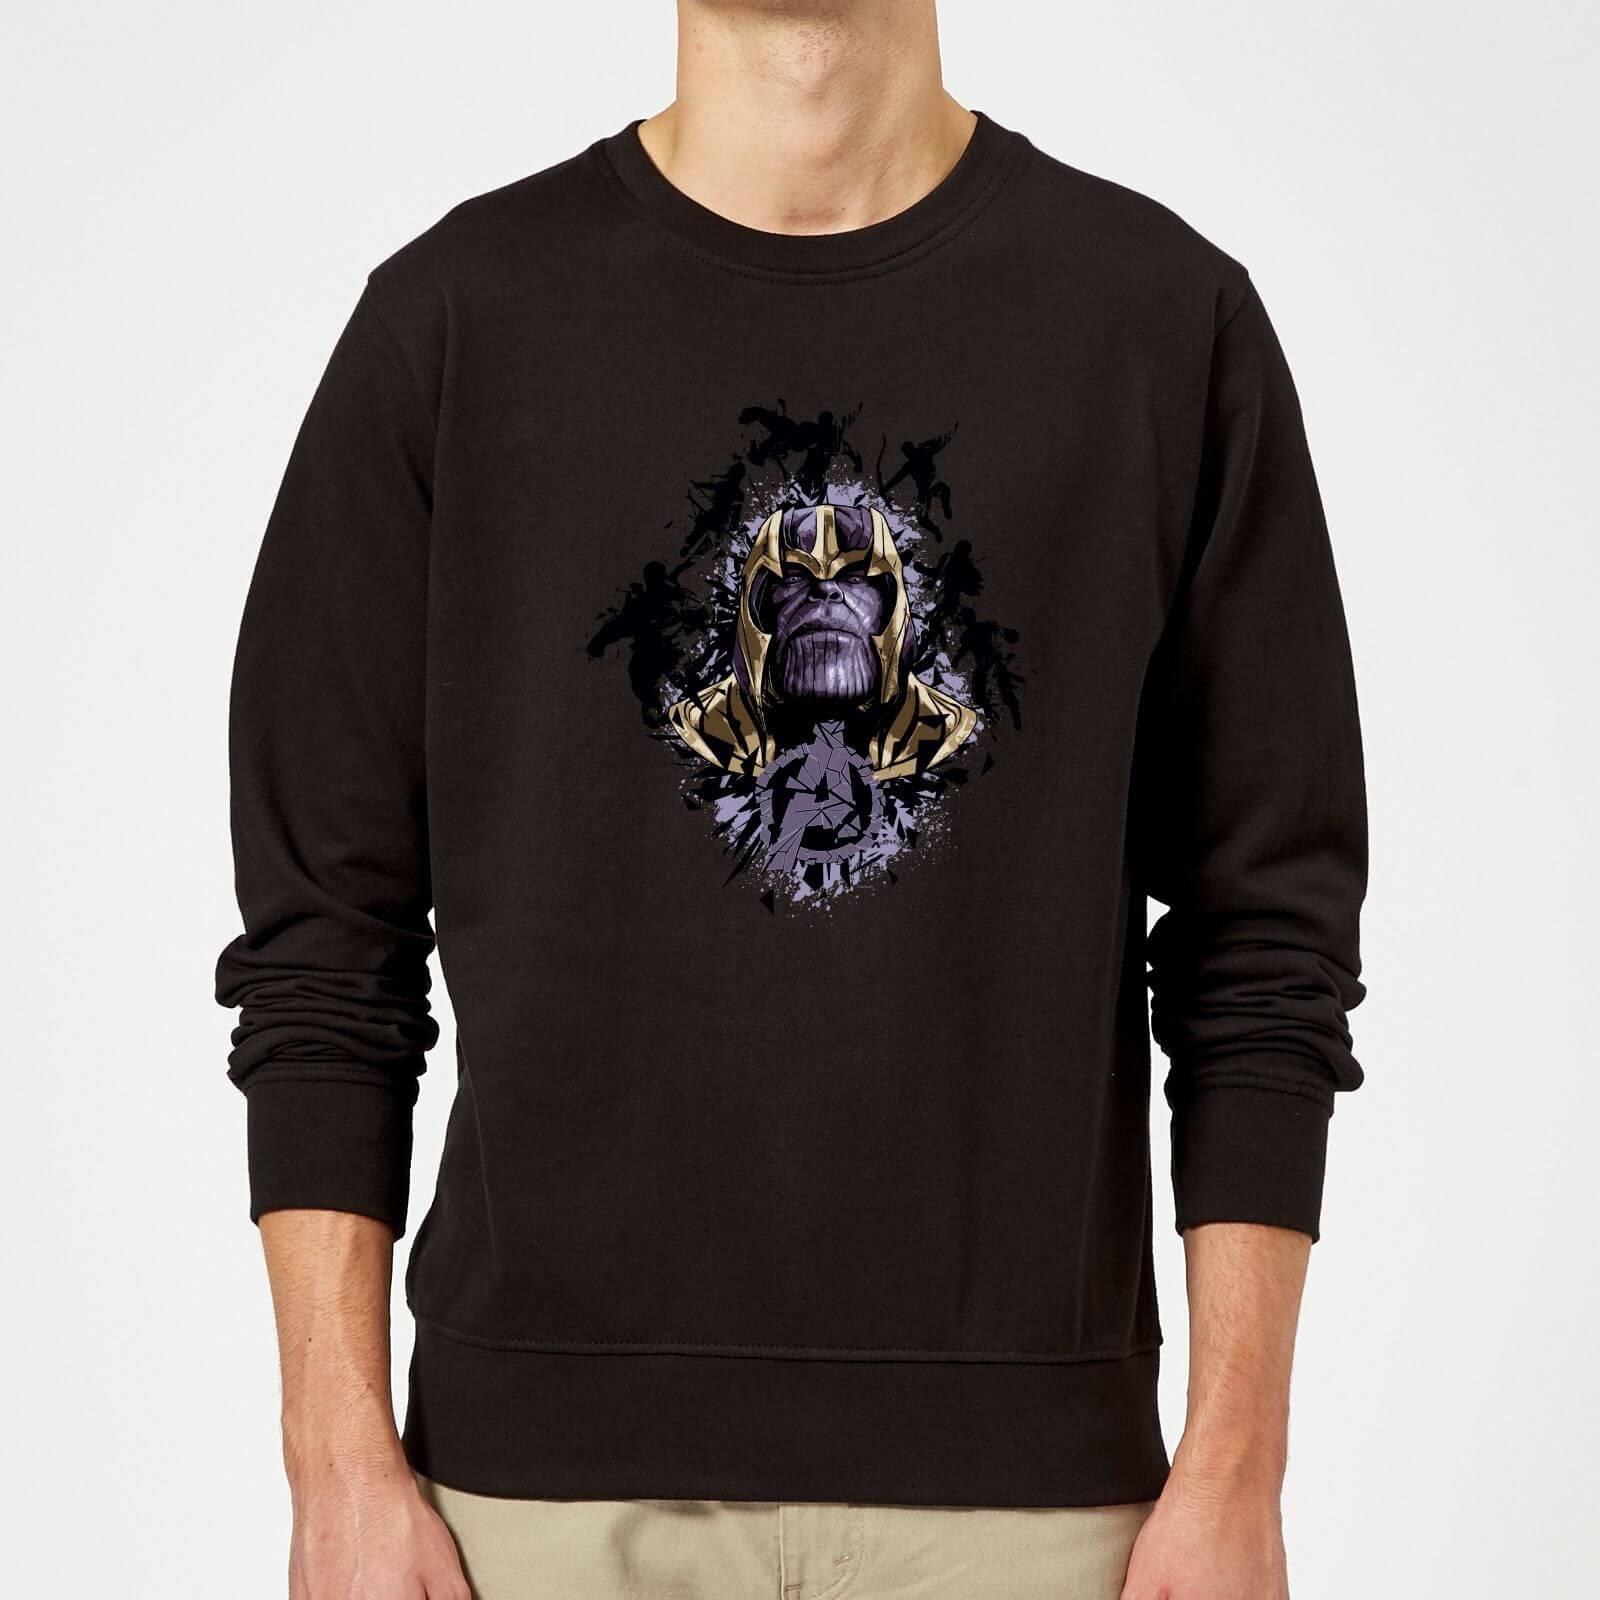 Avengers Endgame Warlord Thanos Sweatshirt - Schwarz - 5XL - Schwarz